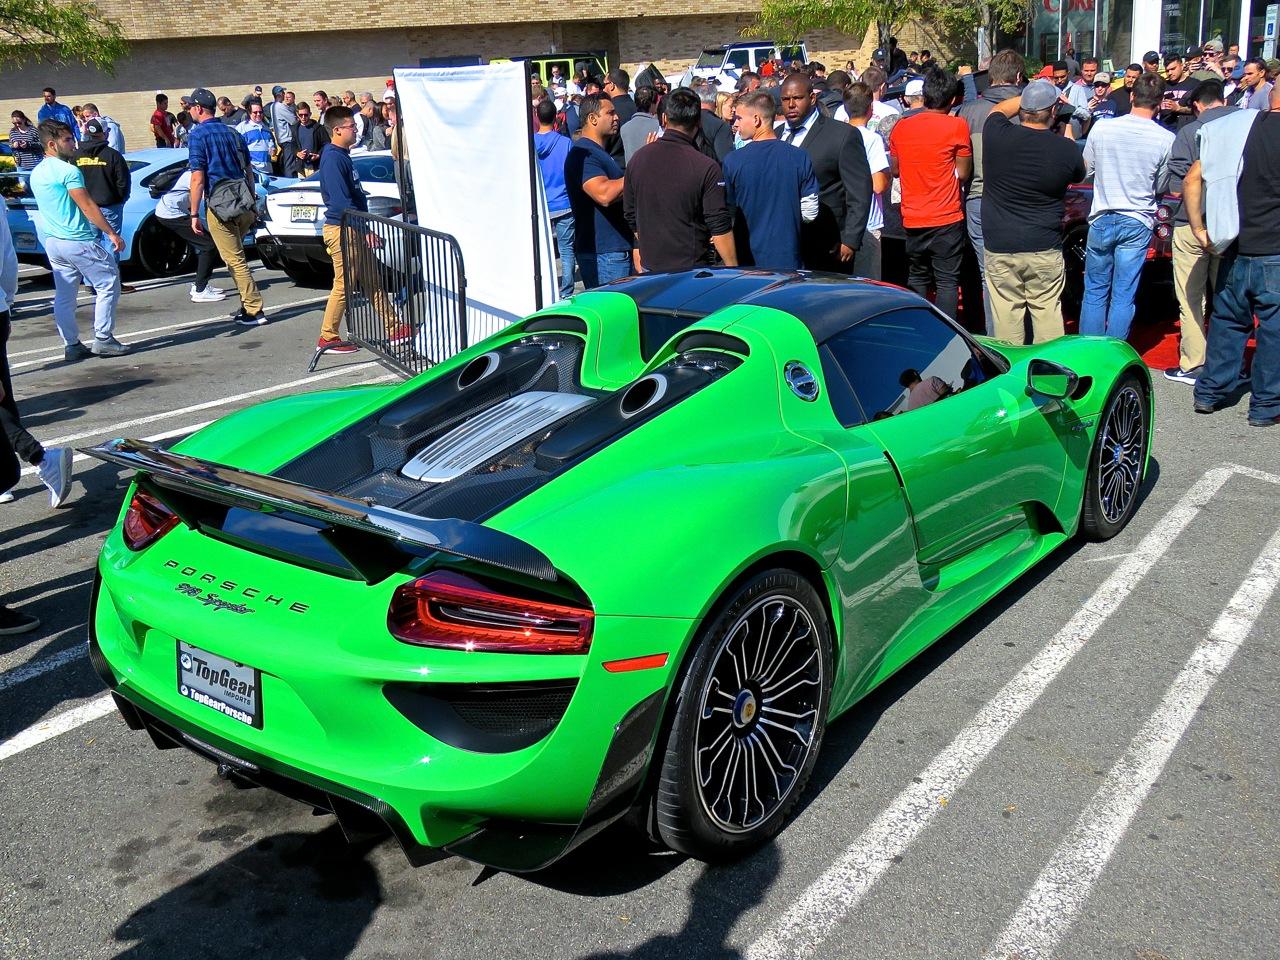 Green Porsche 918 Cars and Caffe 5